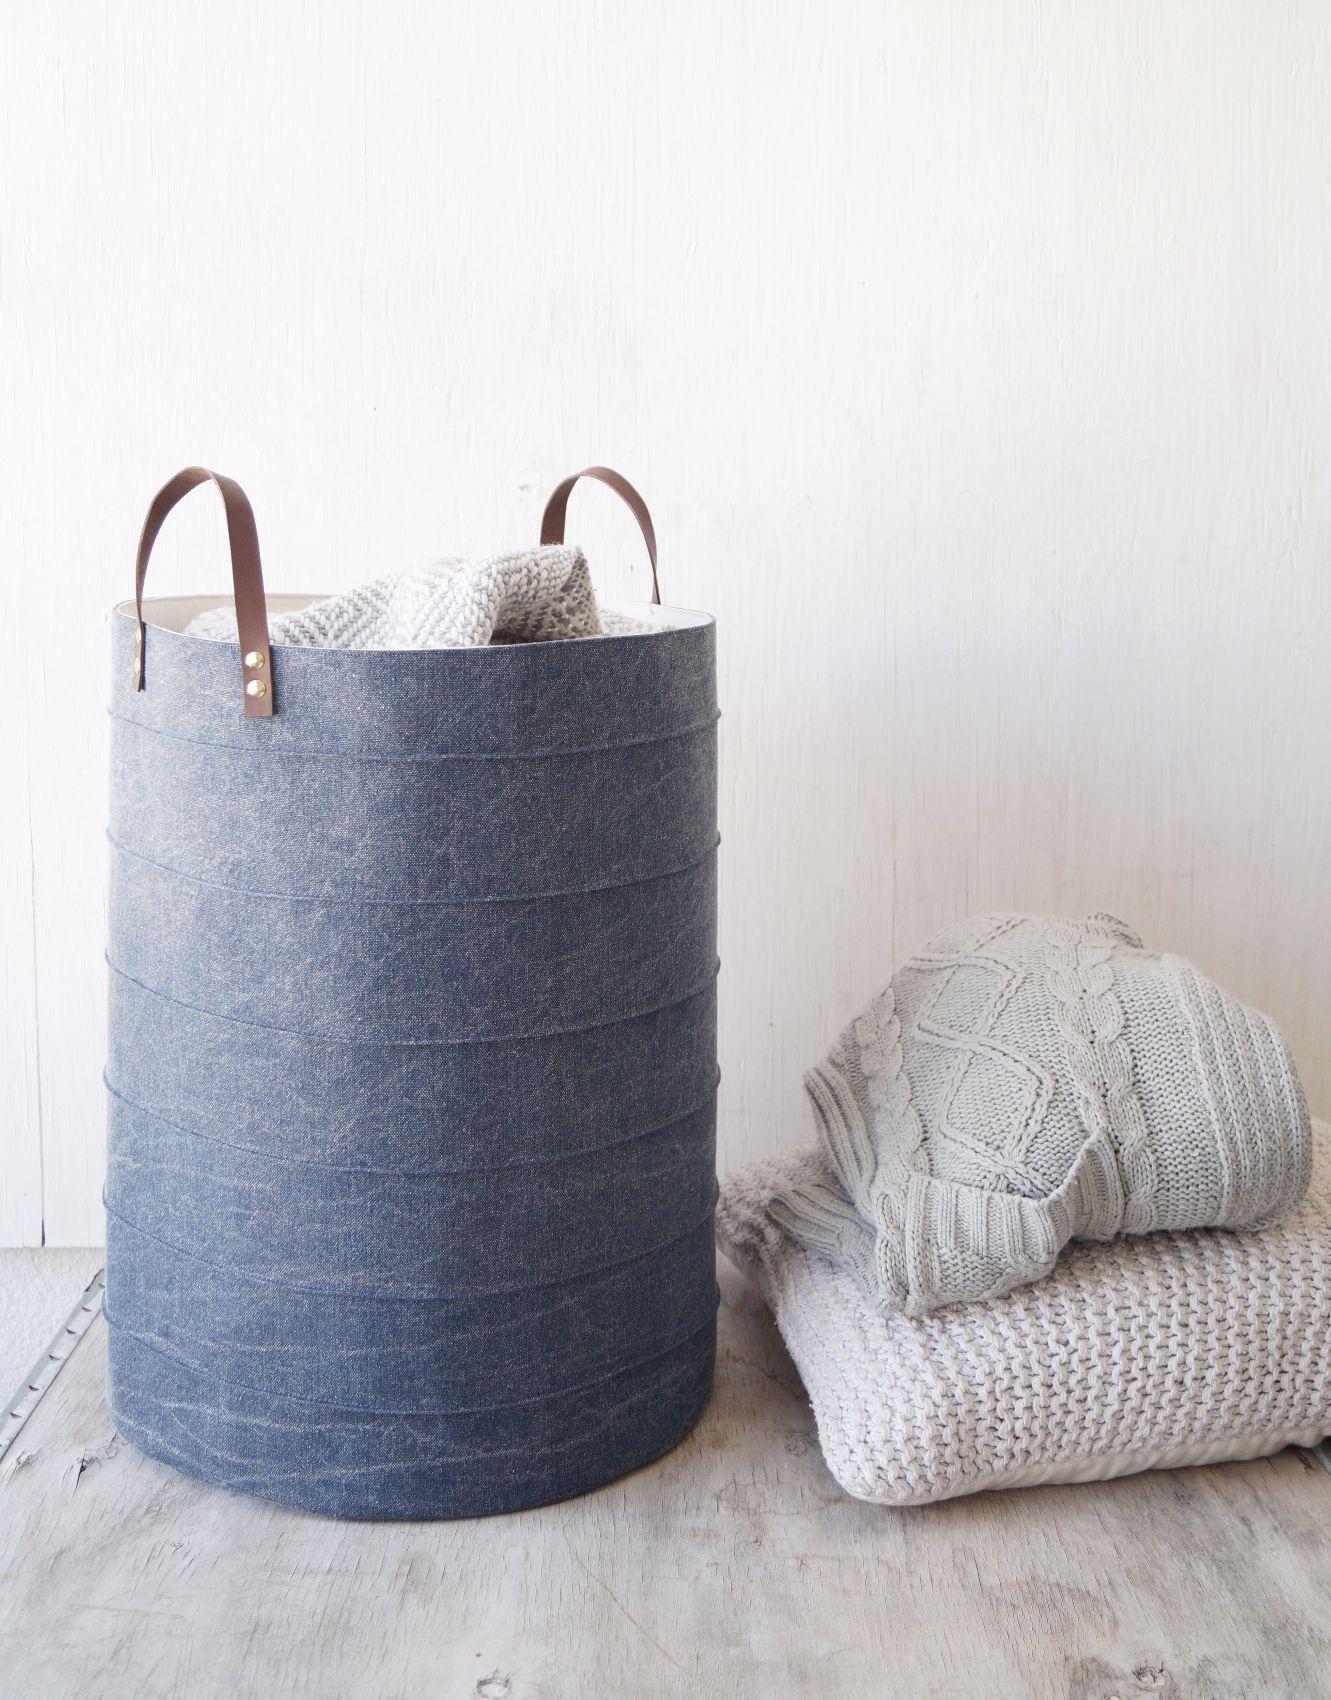 Blue Denim Laundry Hamper Minimalism Home Decor Laundry Room